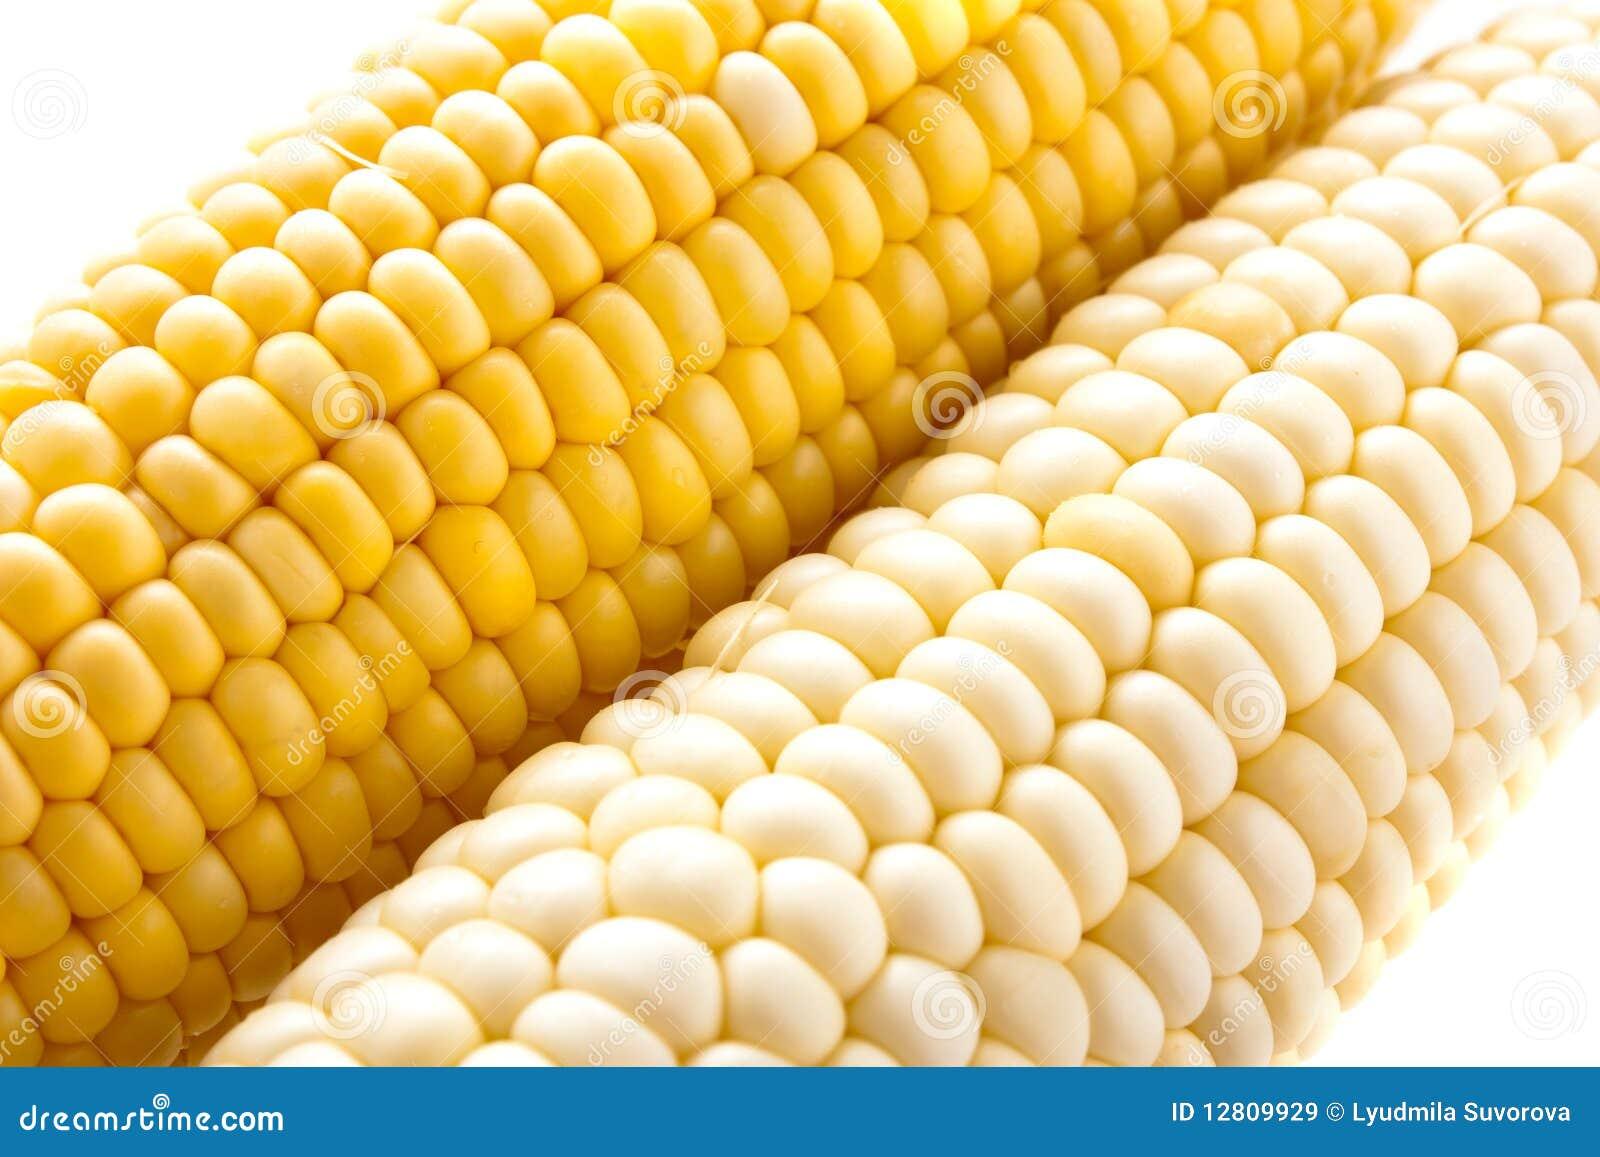 Milho amarelo e branco